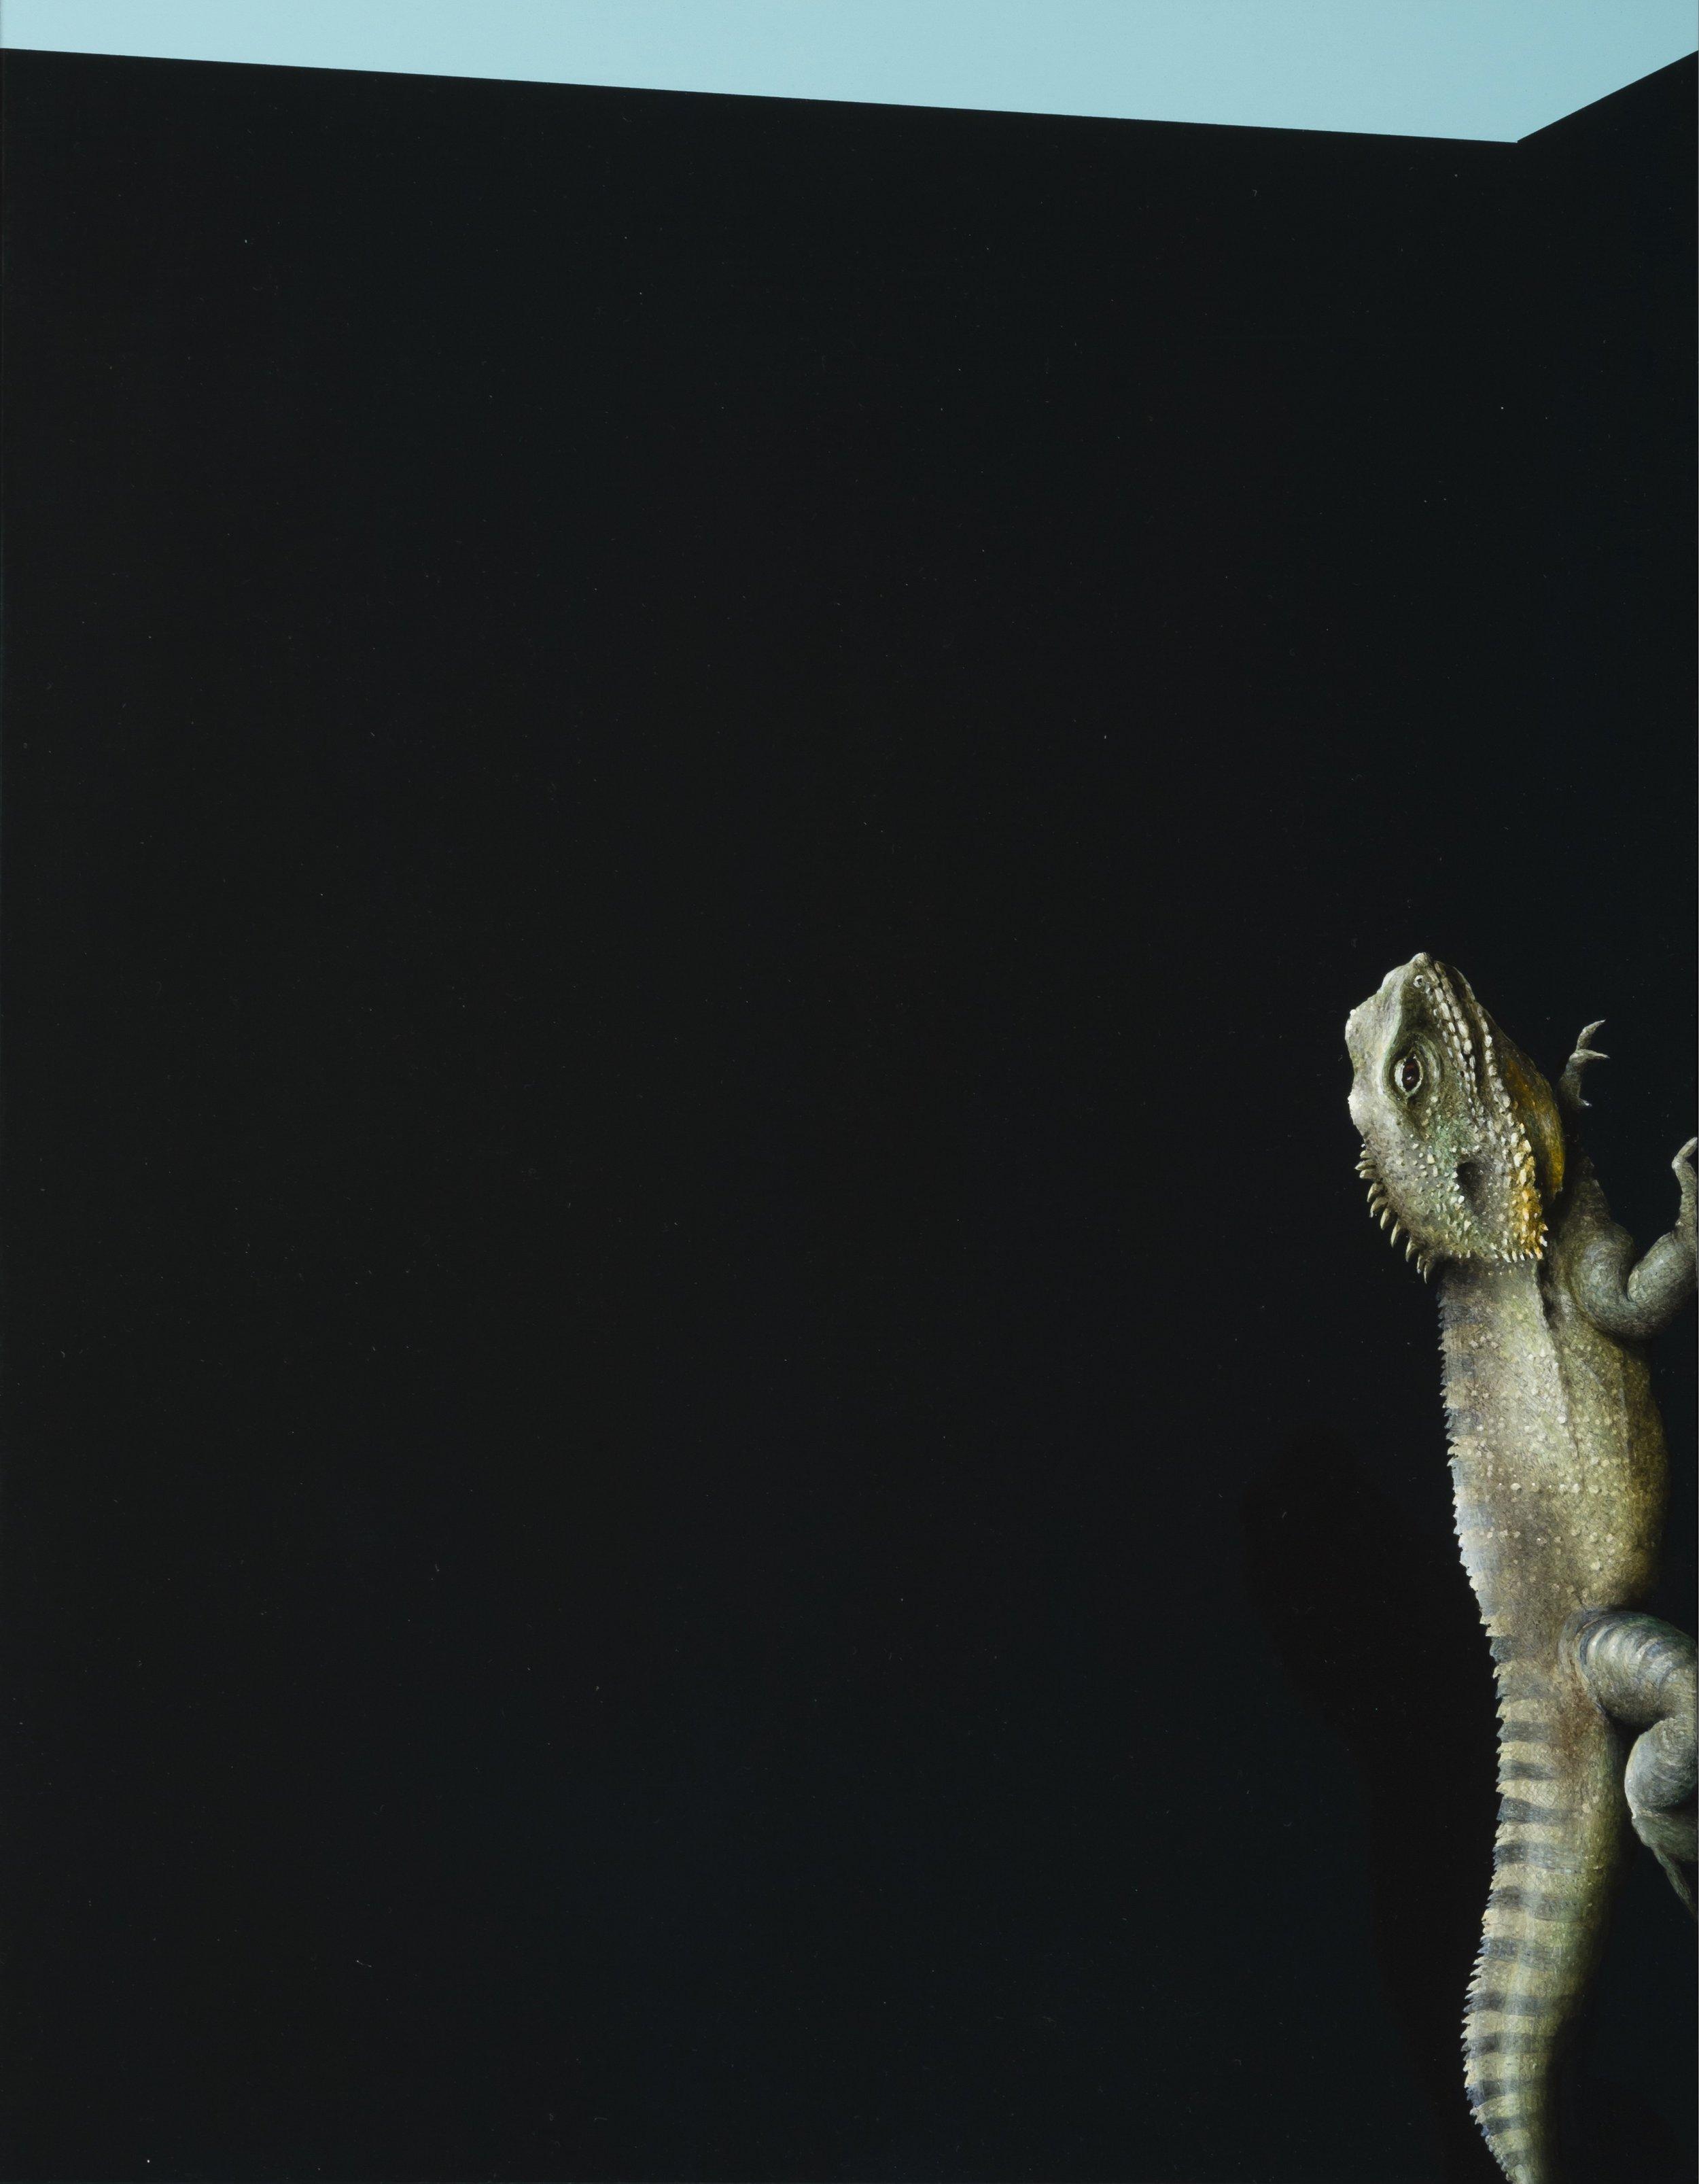 Jarek Wojcik, Spaces and Things 03 , 2015, acrylic on clayboard, 45 x 35cm